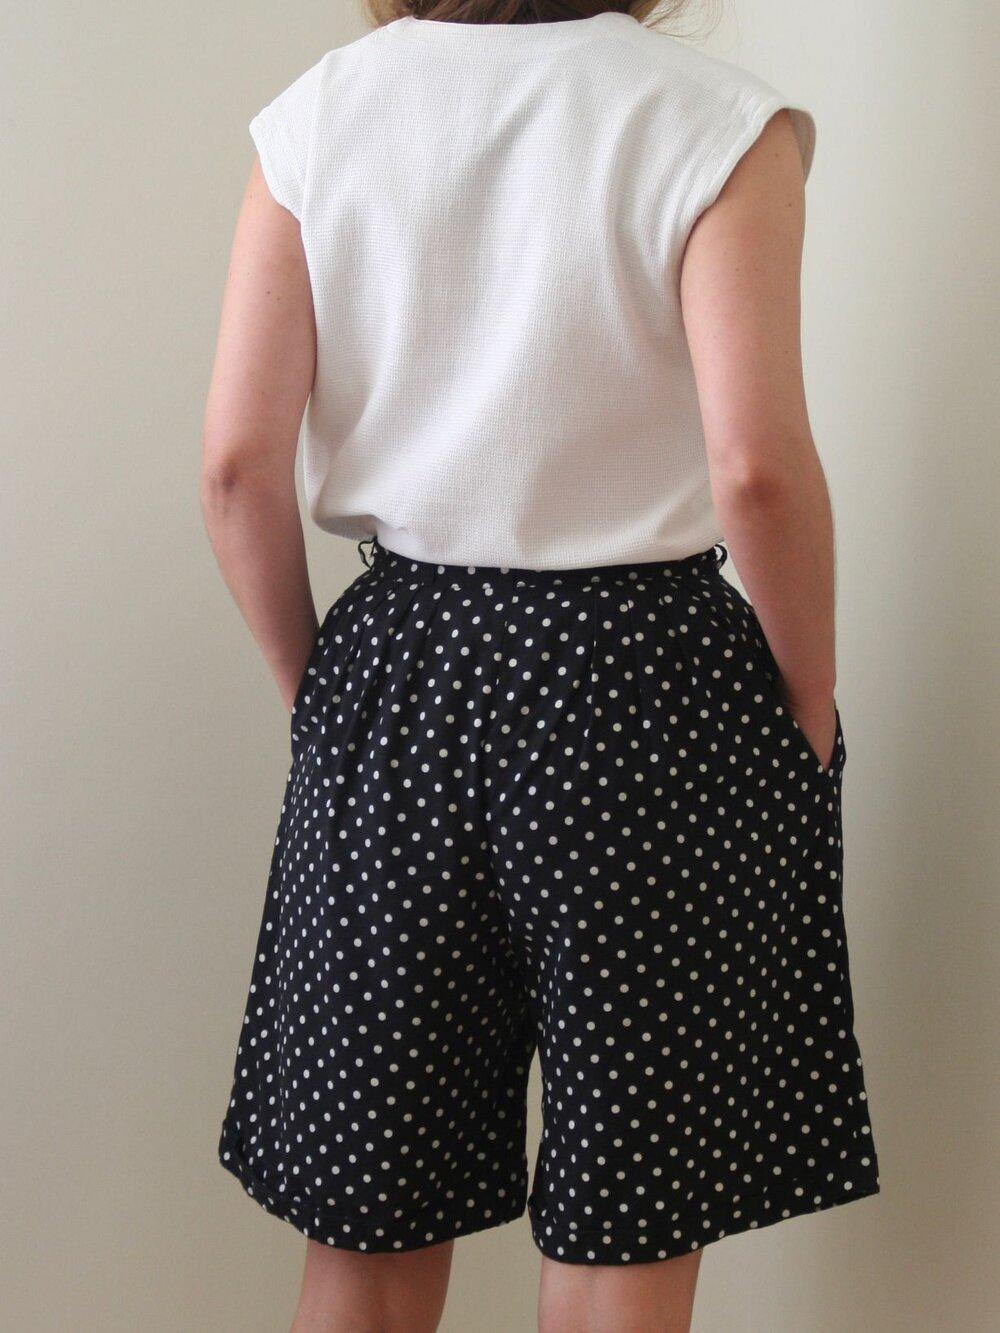 90s Vintage Black Elastic Waist Skirt With White Polka Dots